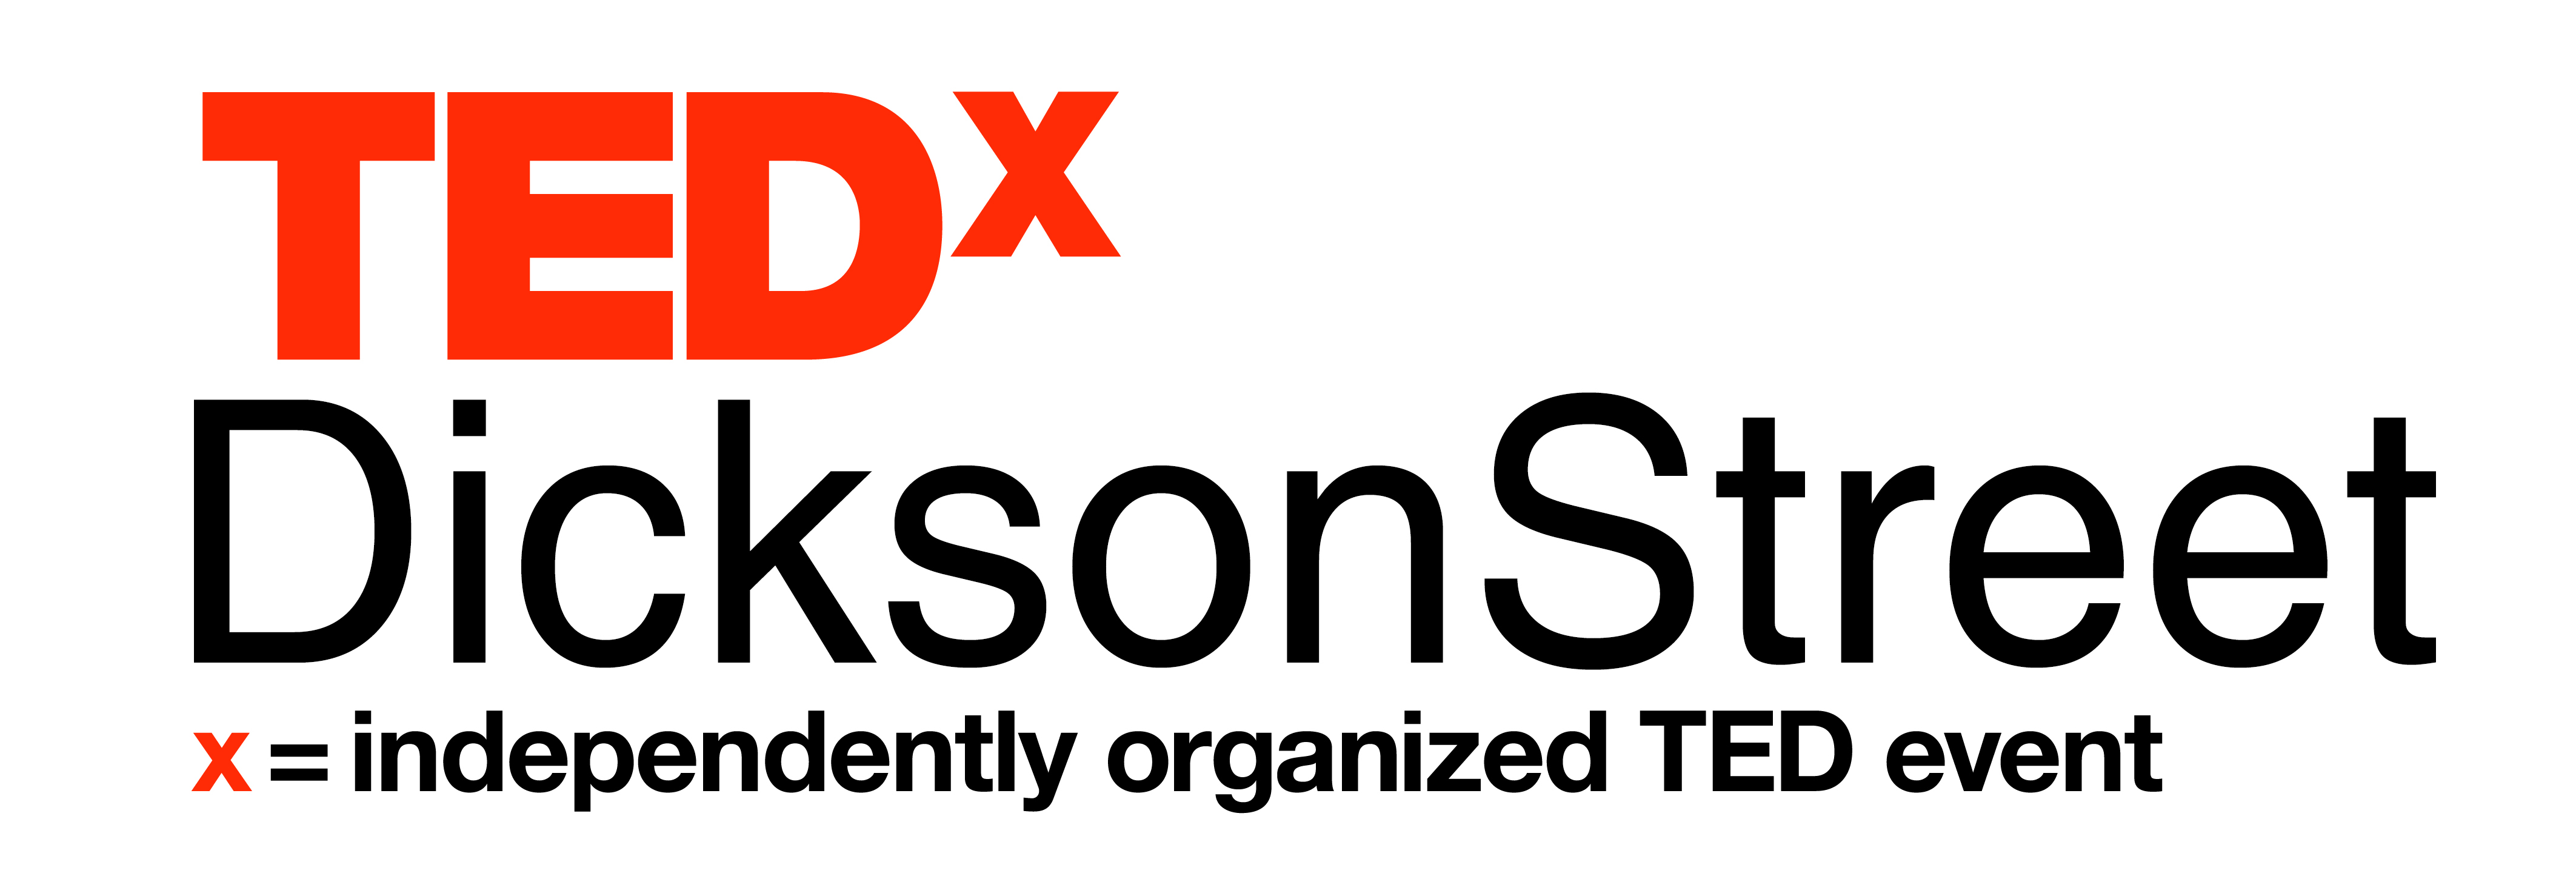 TEDxDicksonStreet